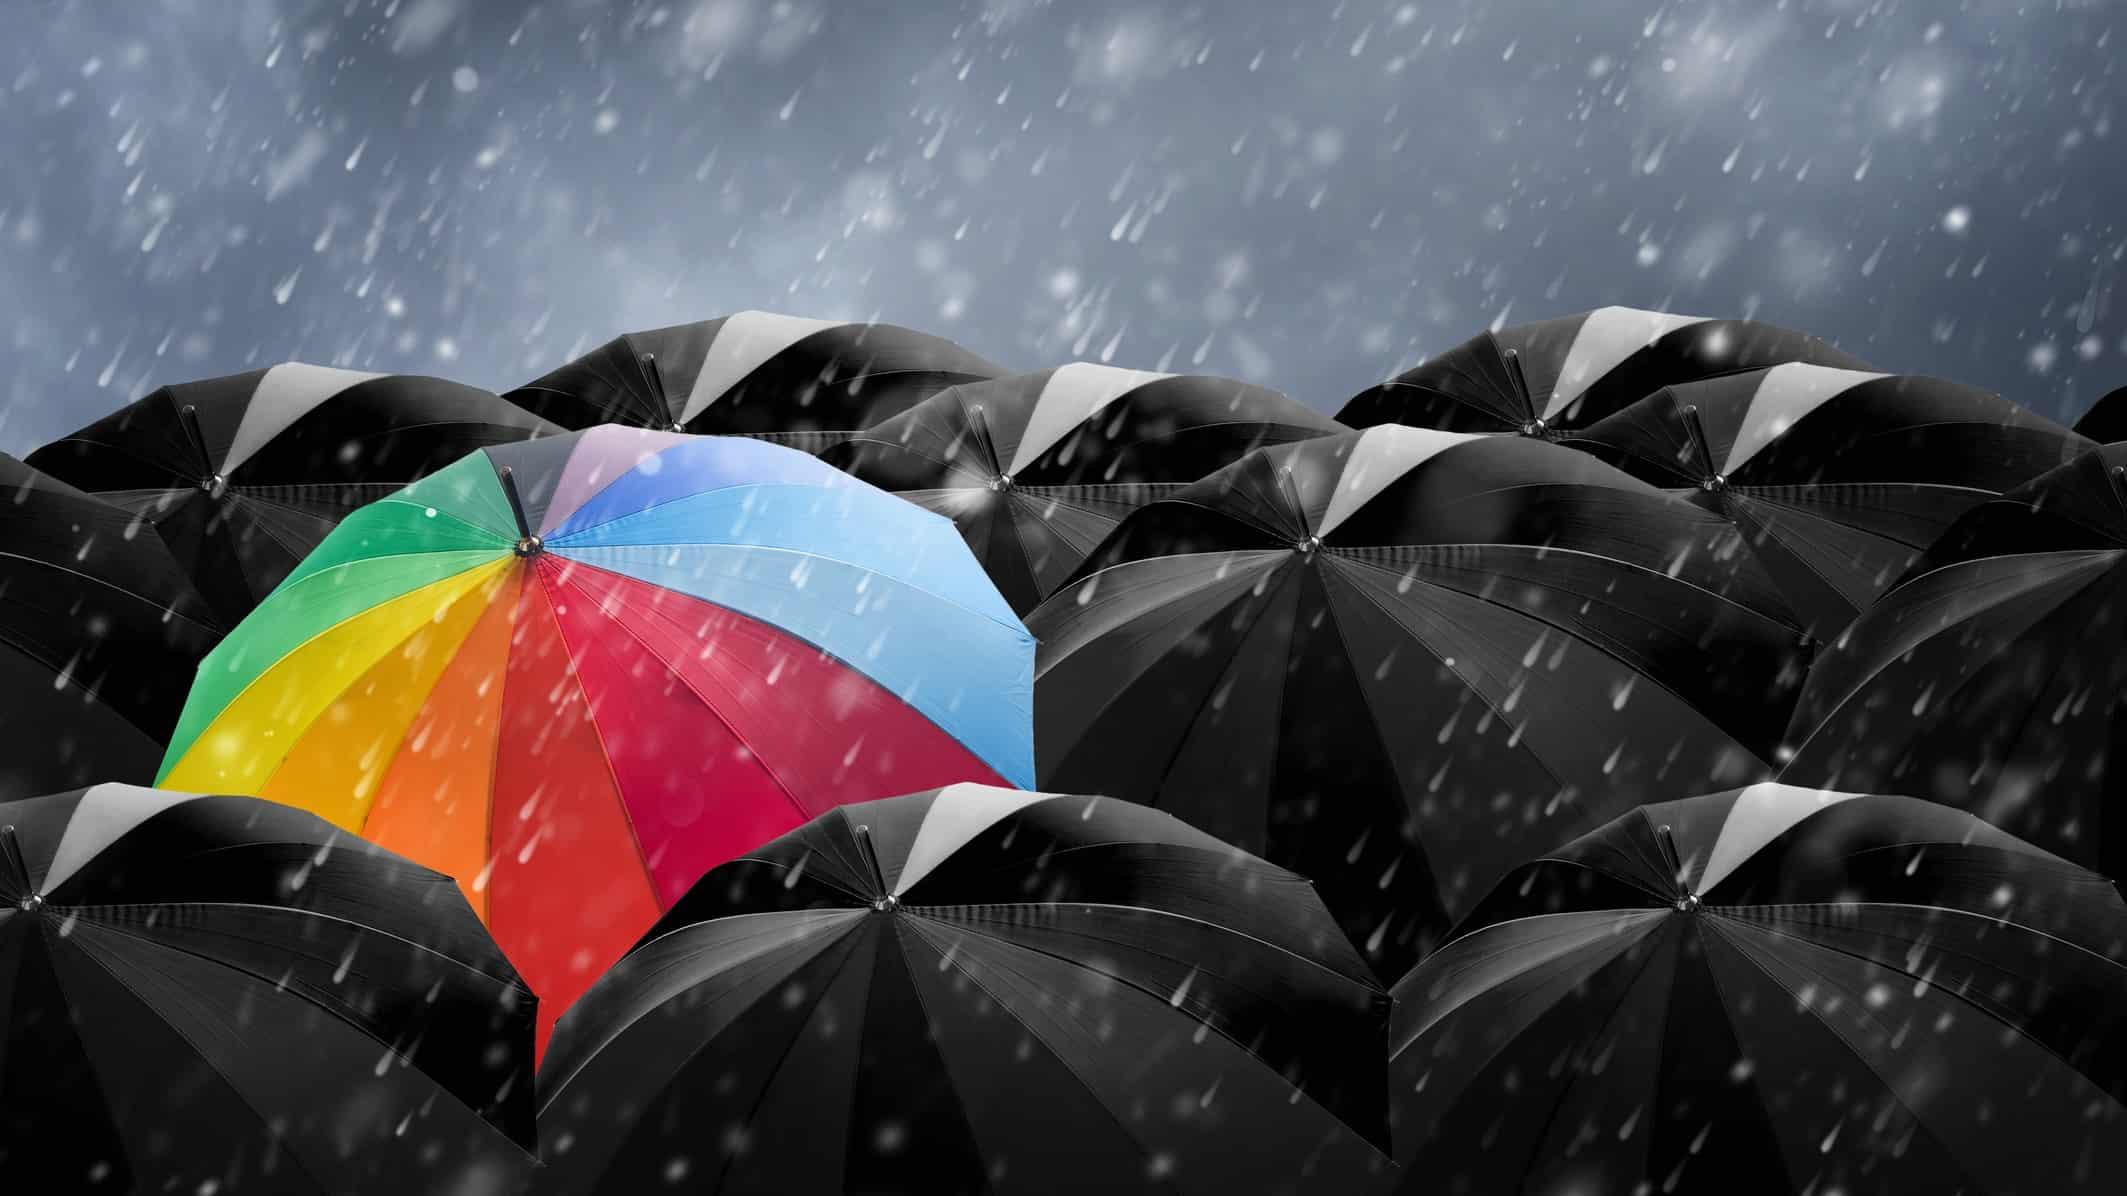 colourful striped umbrella amidst all black umbrellas